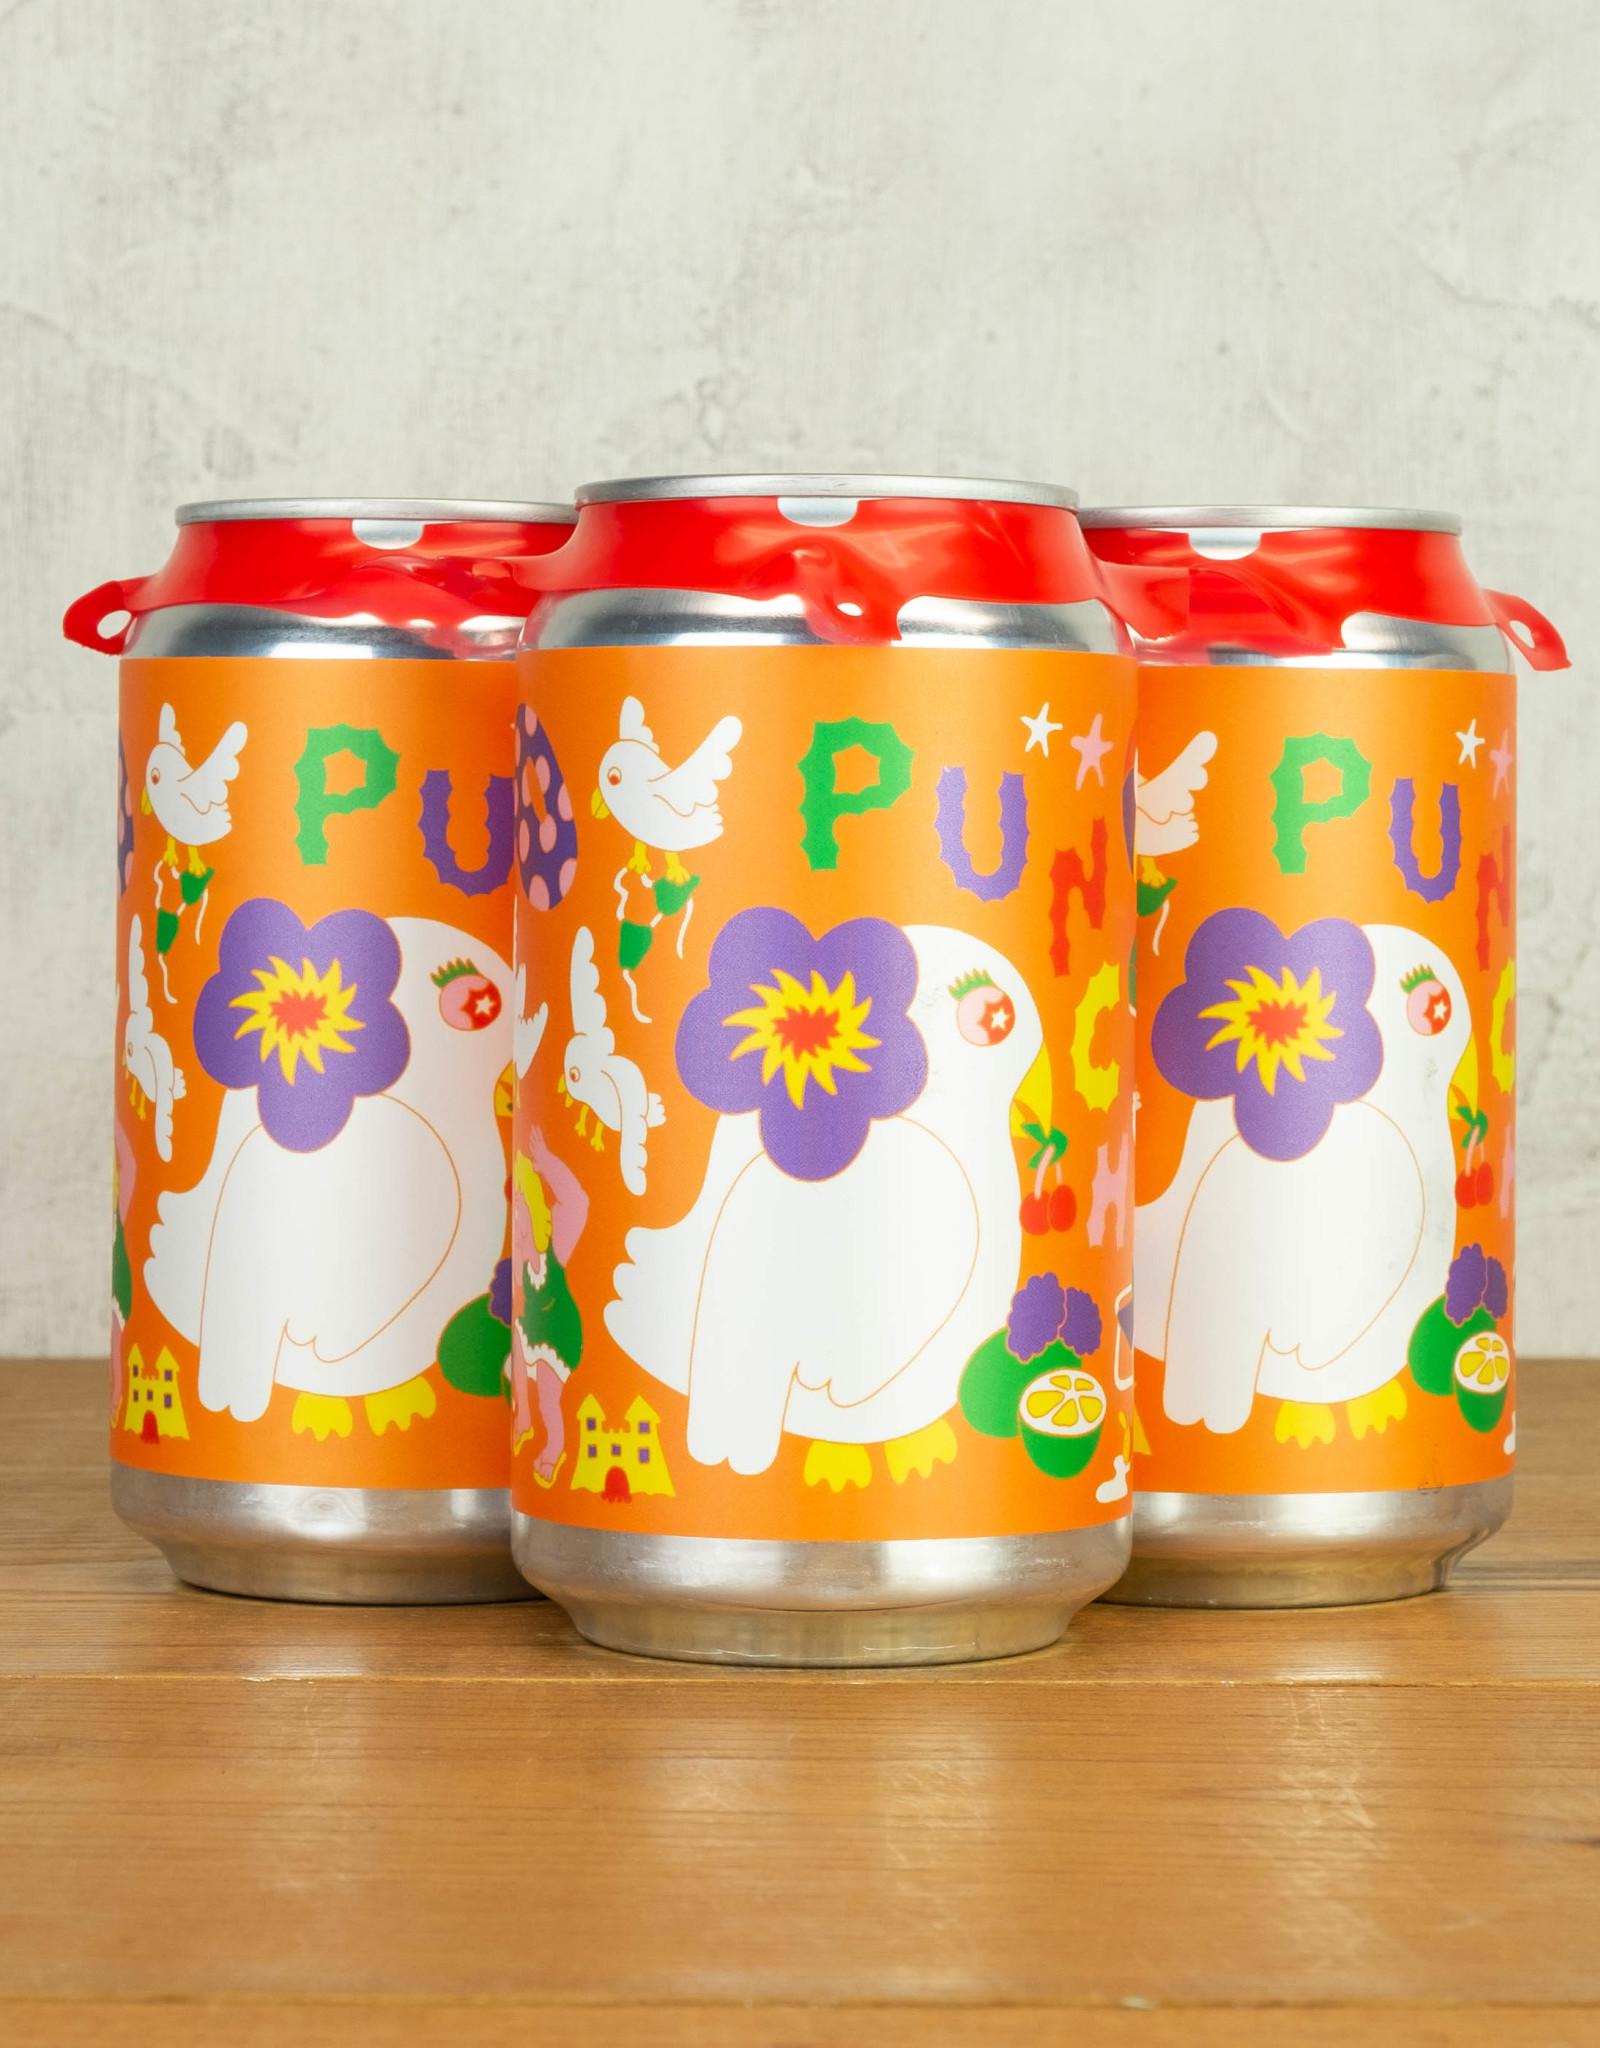 Prairie Artisan Ales Punch 4pk